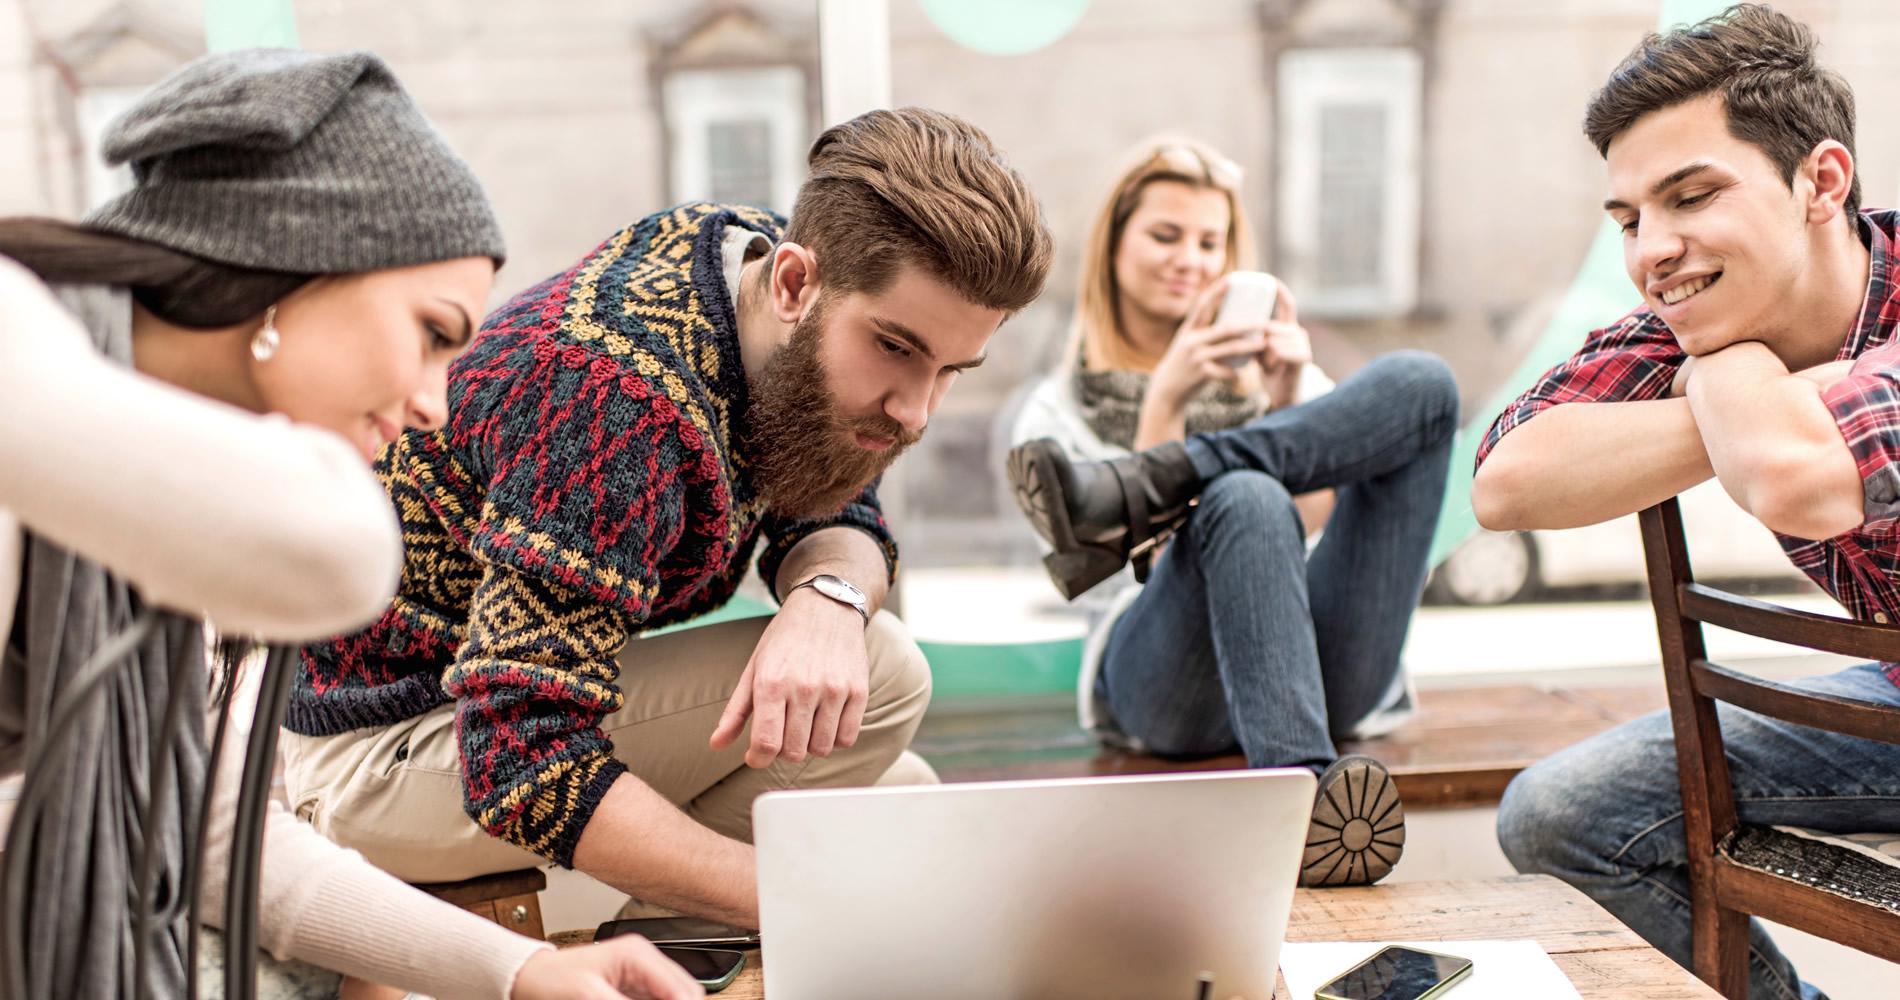 Harnessing big data to market to Millennials.